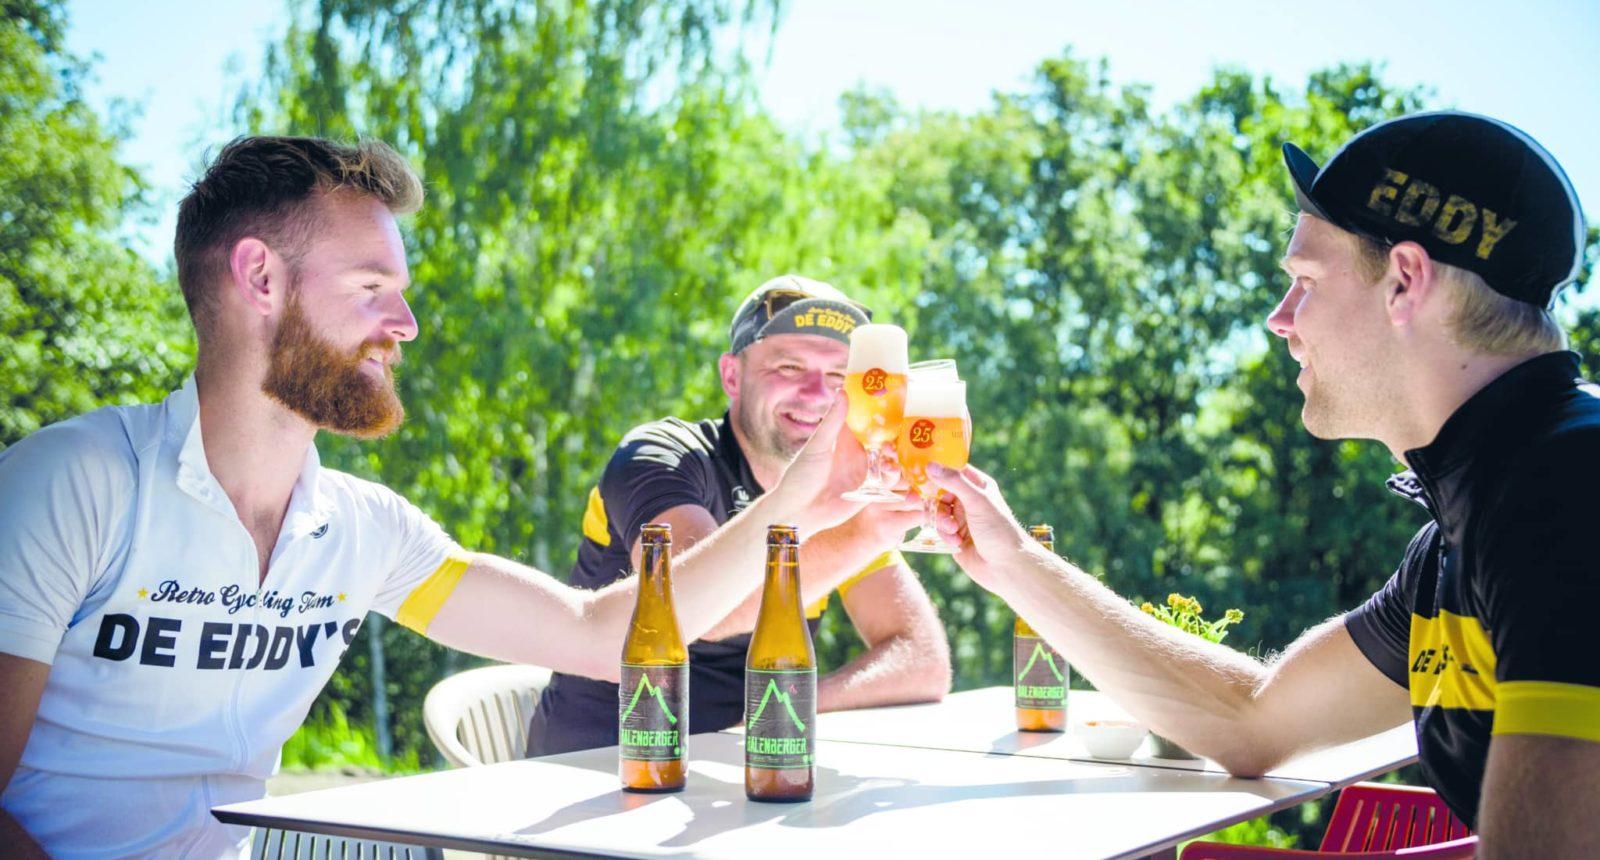 Sncc Cafe Velo Beer 5 Lander Loekx